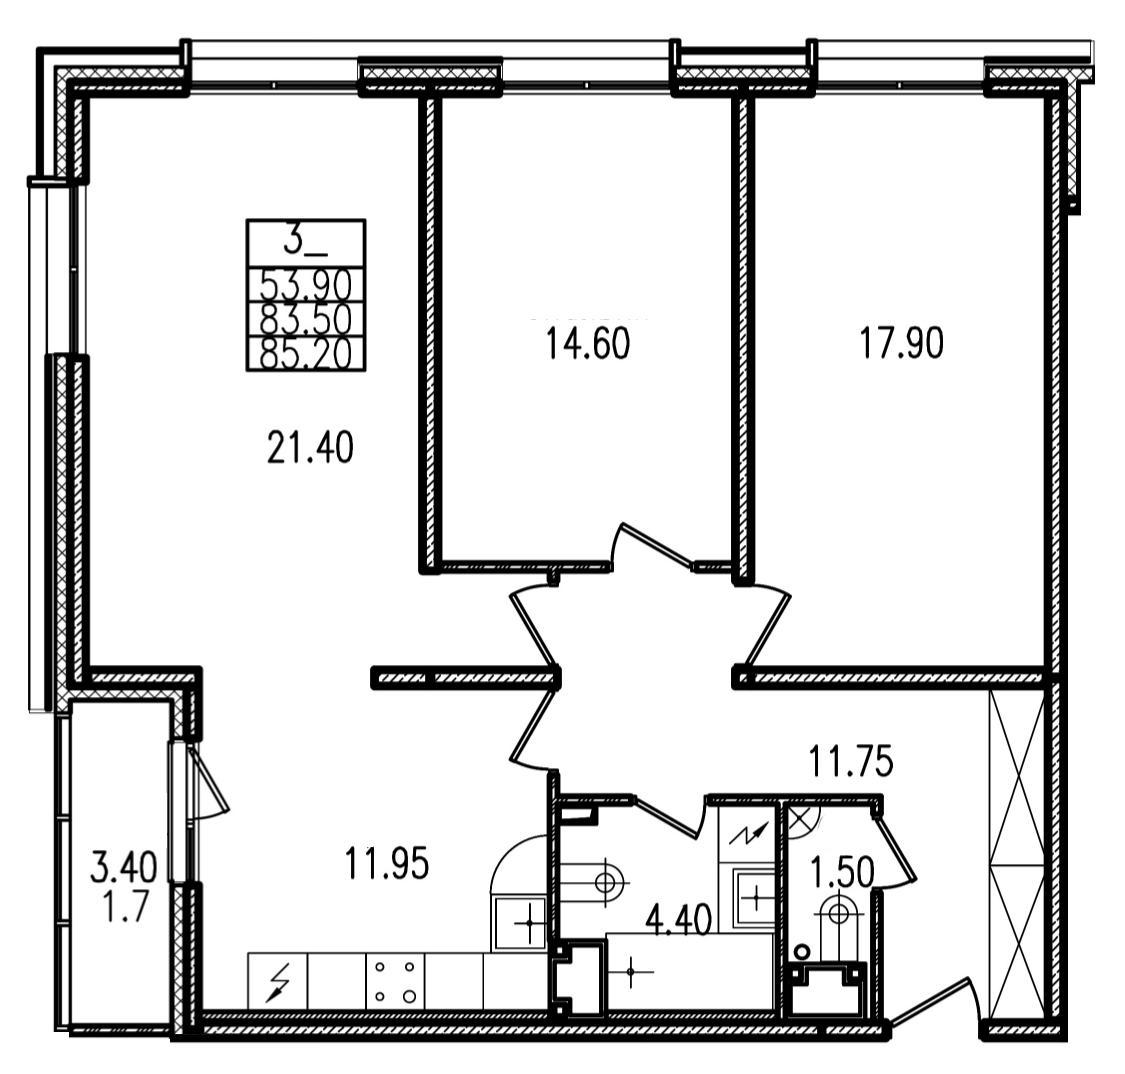 Планировка Трёхкомнатная квартира площадью 85.2 кв.м в ЖК «Европа Сити»